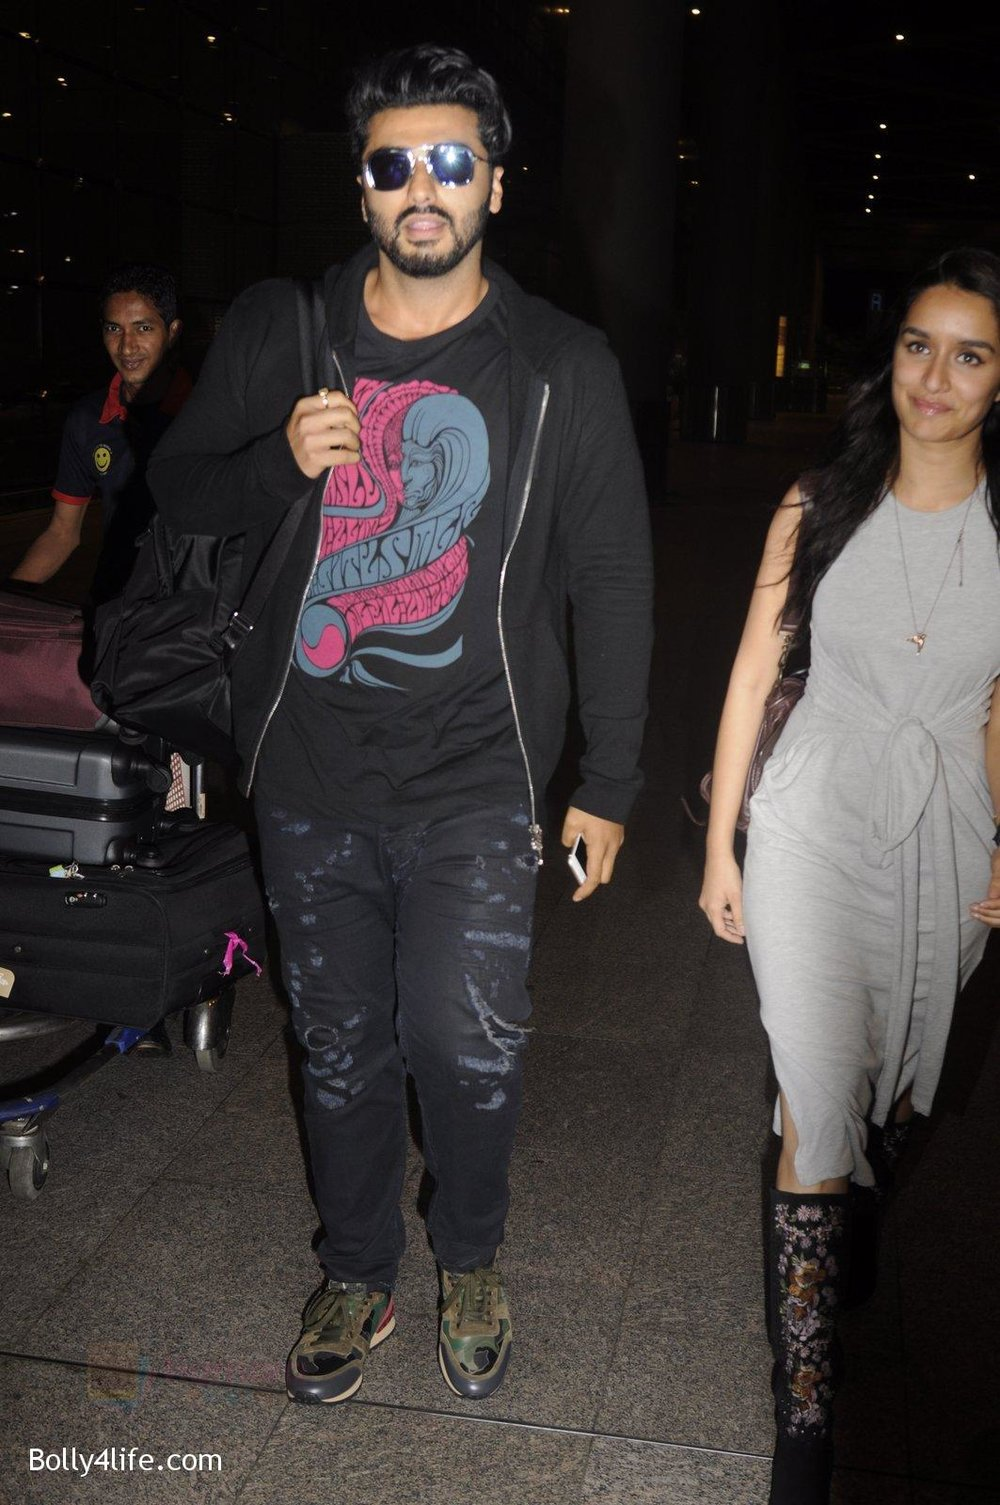 Shraddha-Kapoor-and-Arjun-Kapoor-return-from-NY-on-15th-Sept-2016-13.jpg